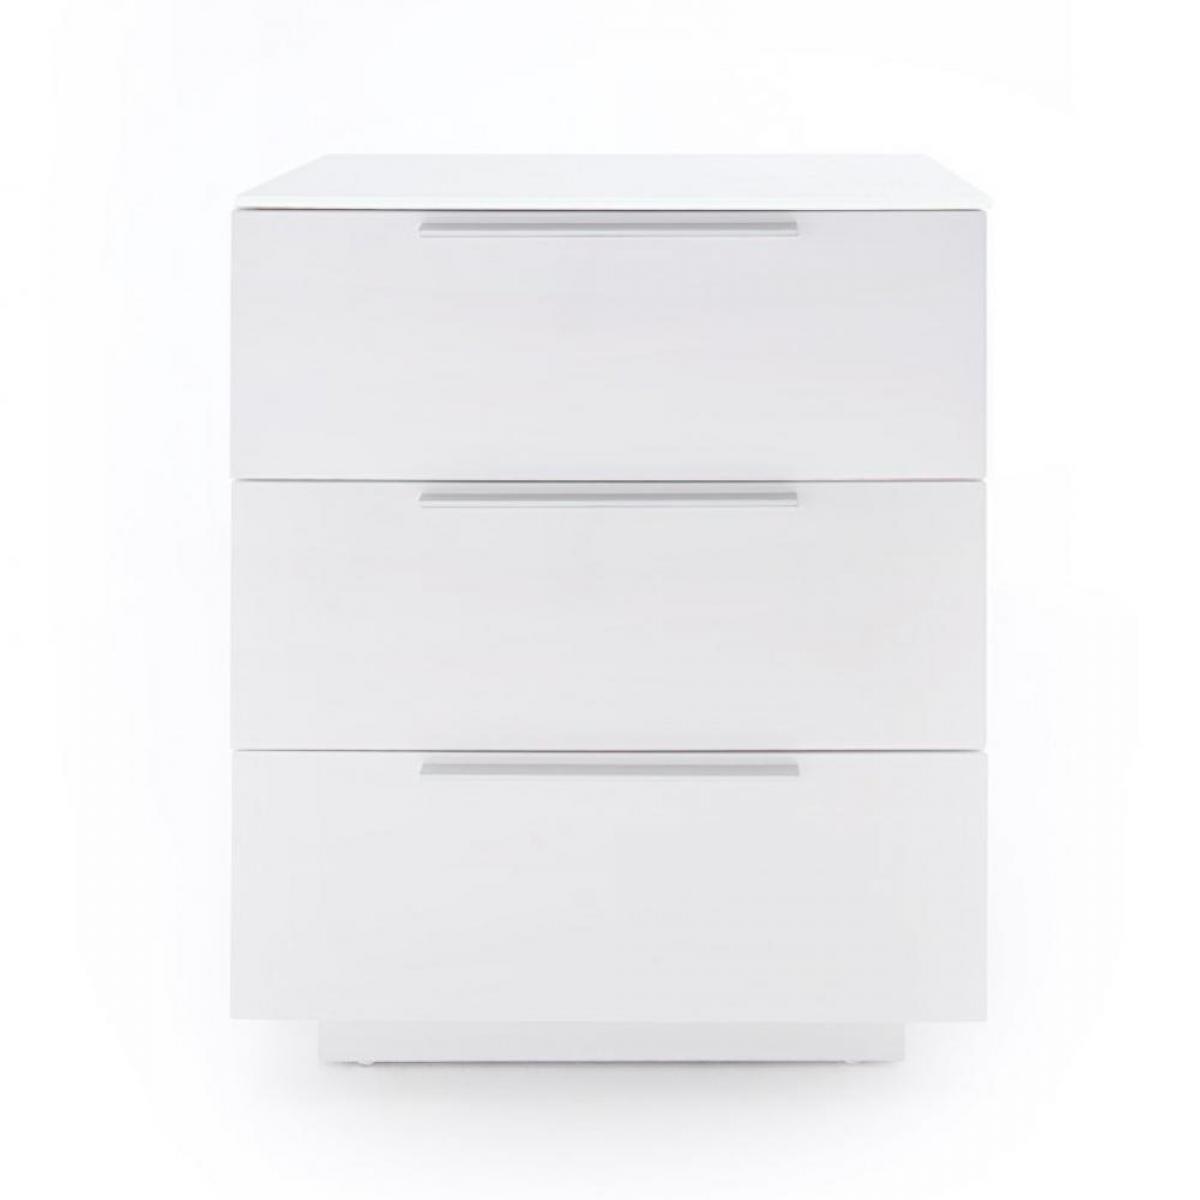 Inside 75 Chevet NOVO laqué blanc brillant plateau verre blanc 3 tiroirs